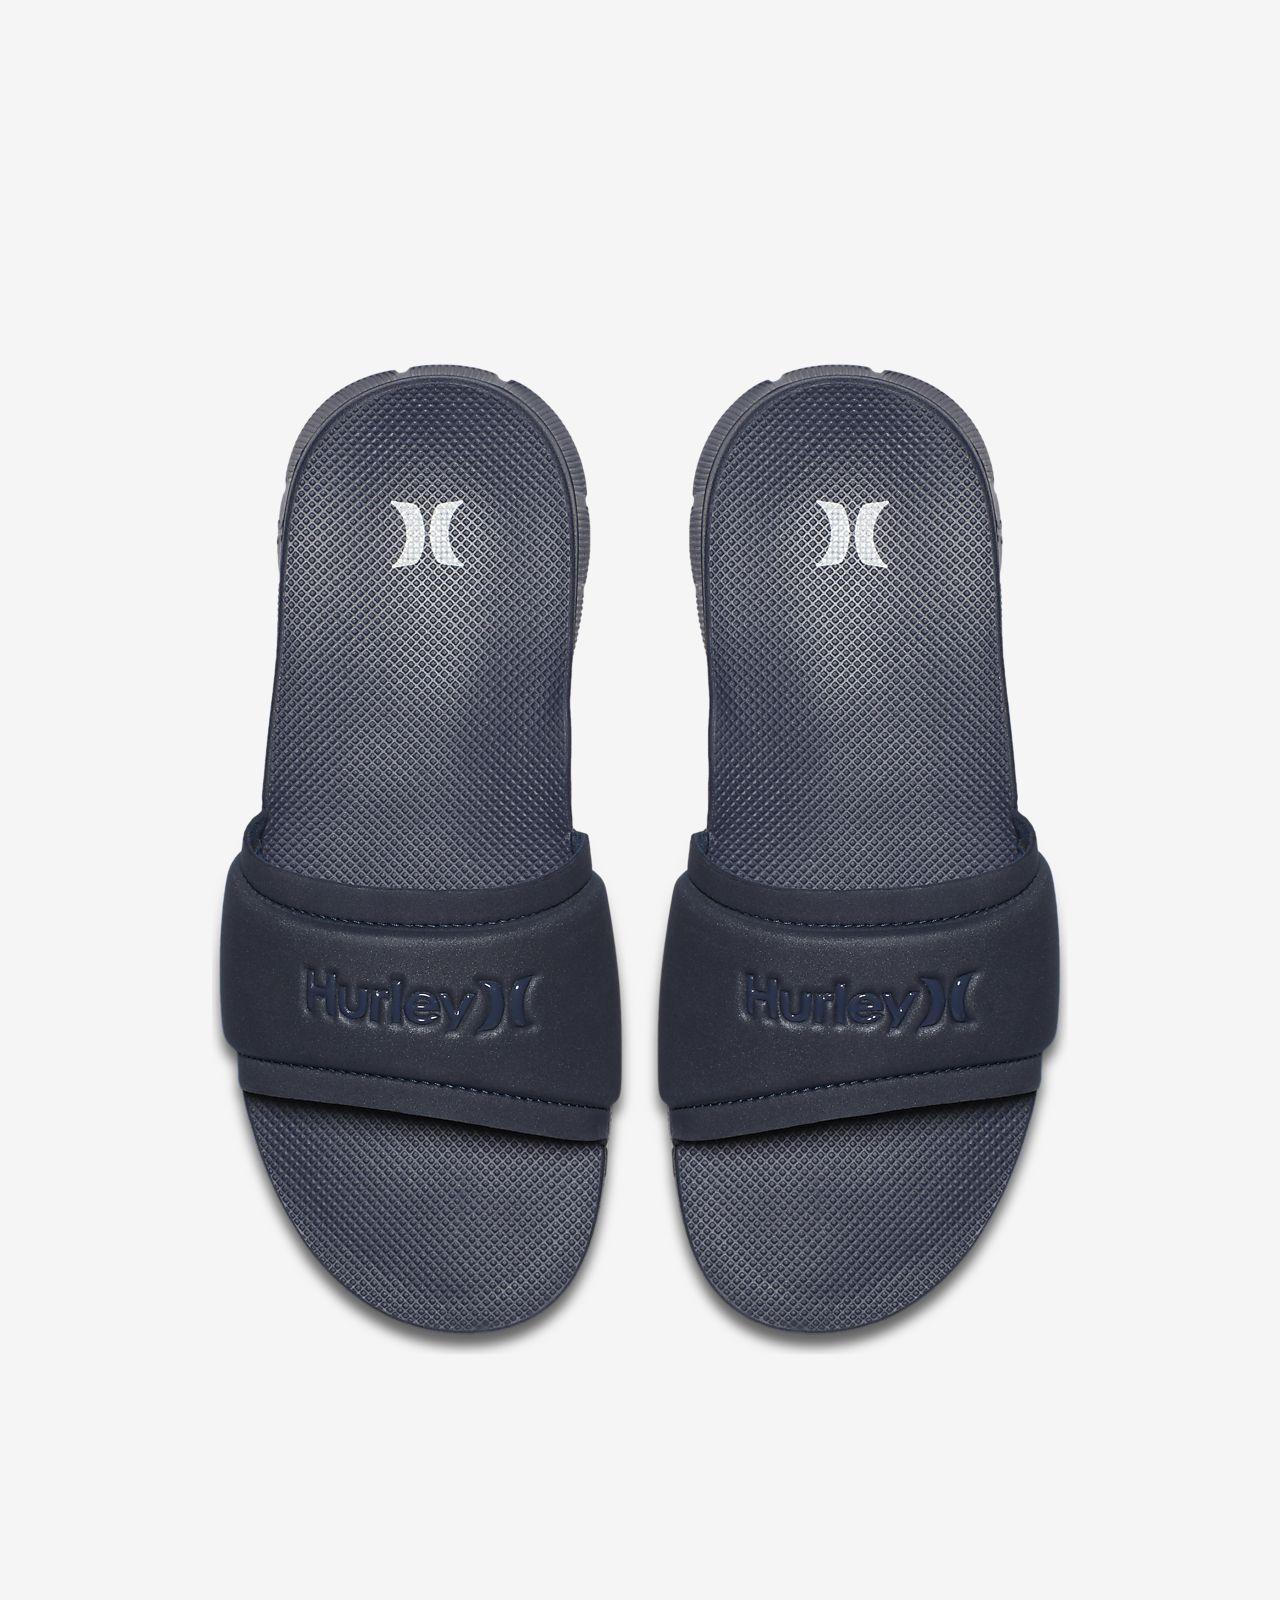 Dámské pantofle Hurley Fusion. Nike.com CZ 456a4cd728